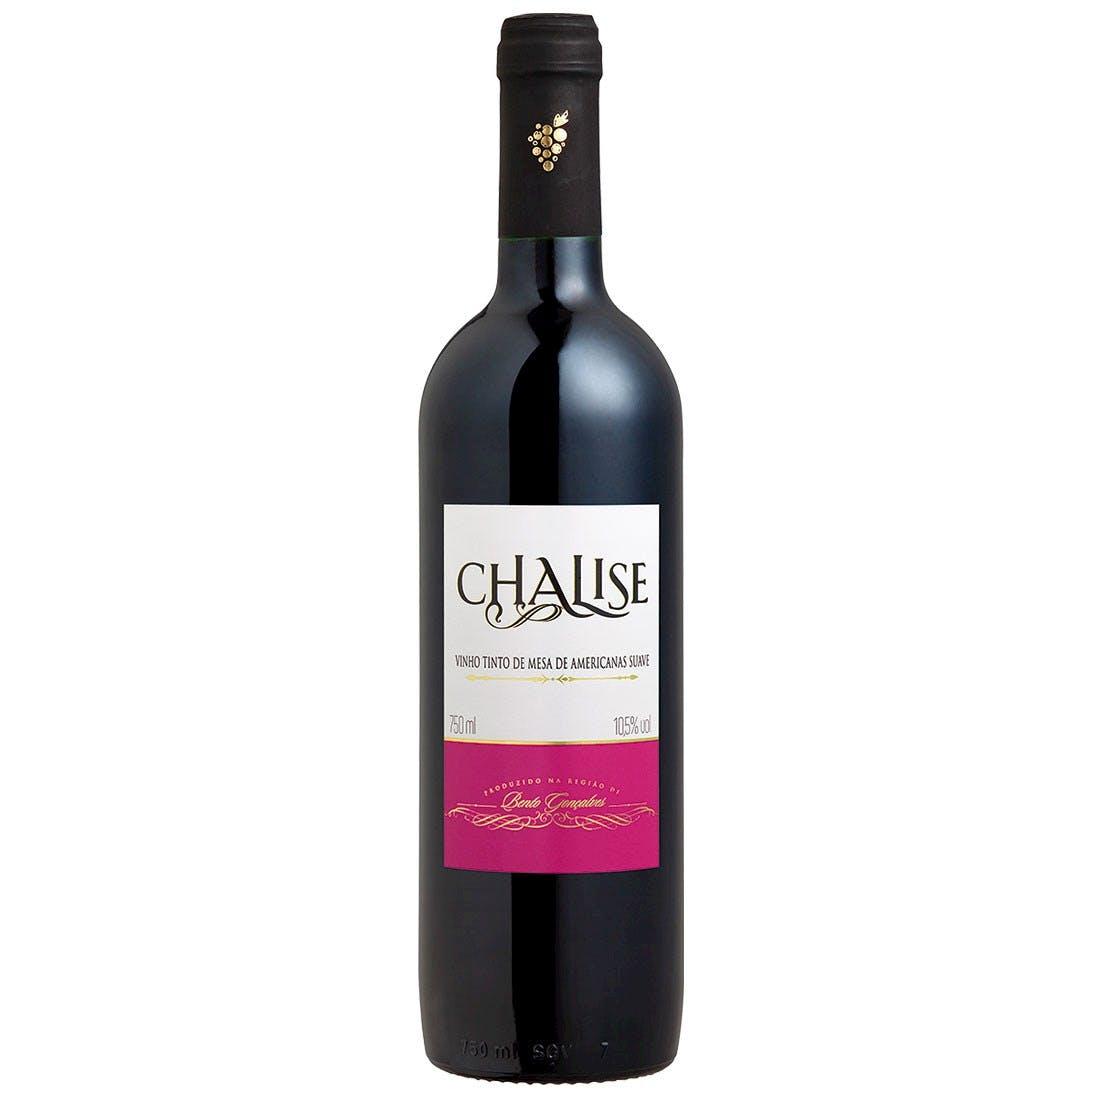 Vinho Tinto de Mesa Suave Chalise 750ml